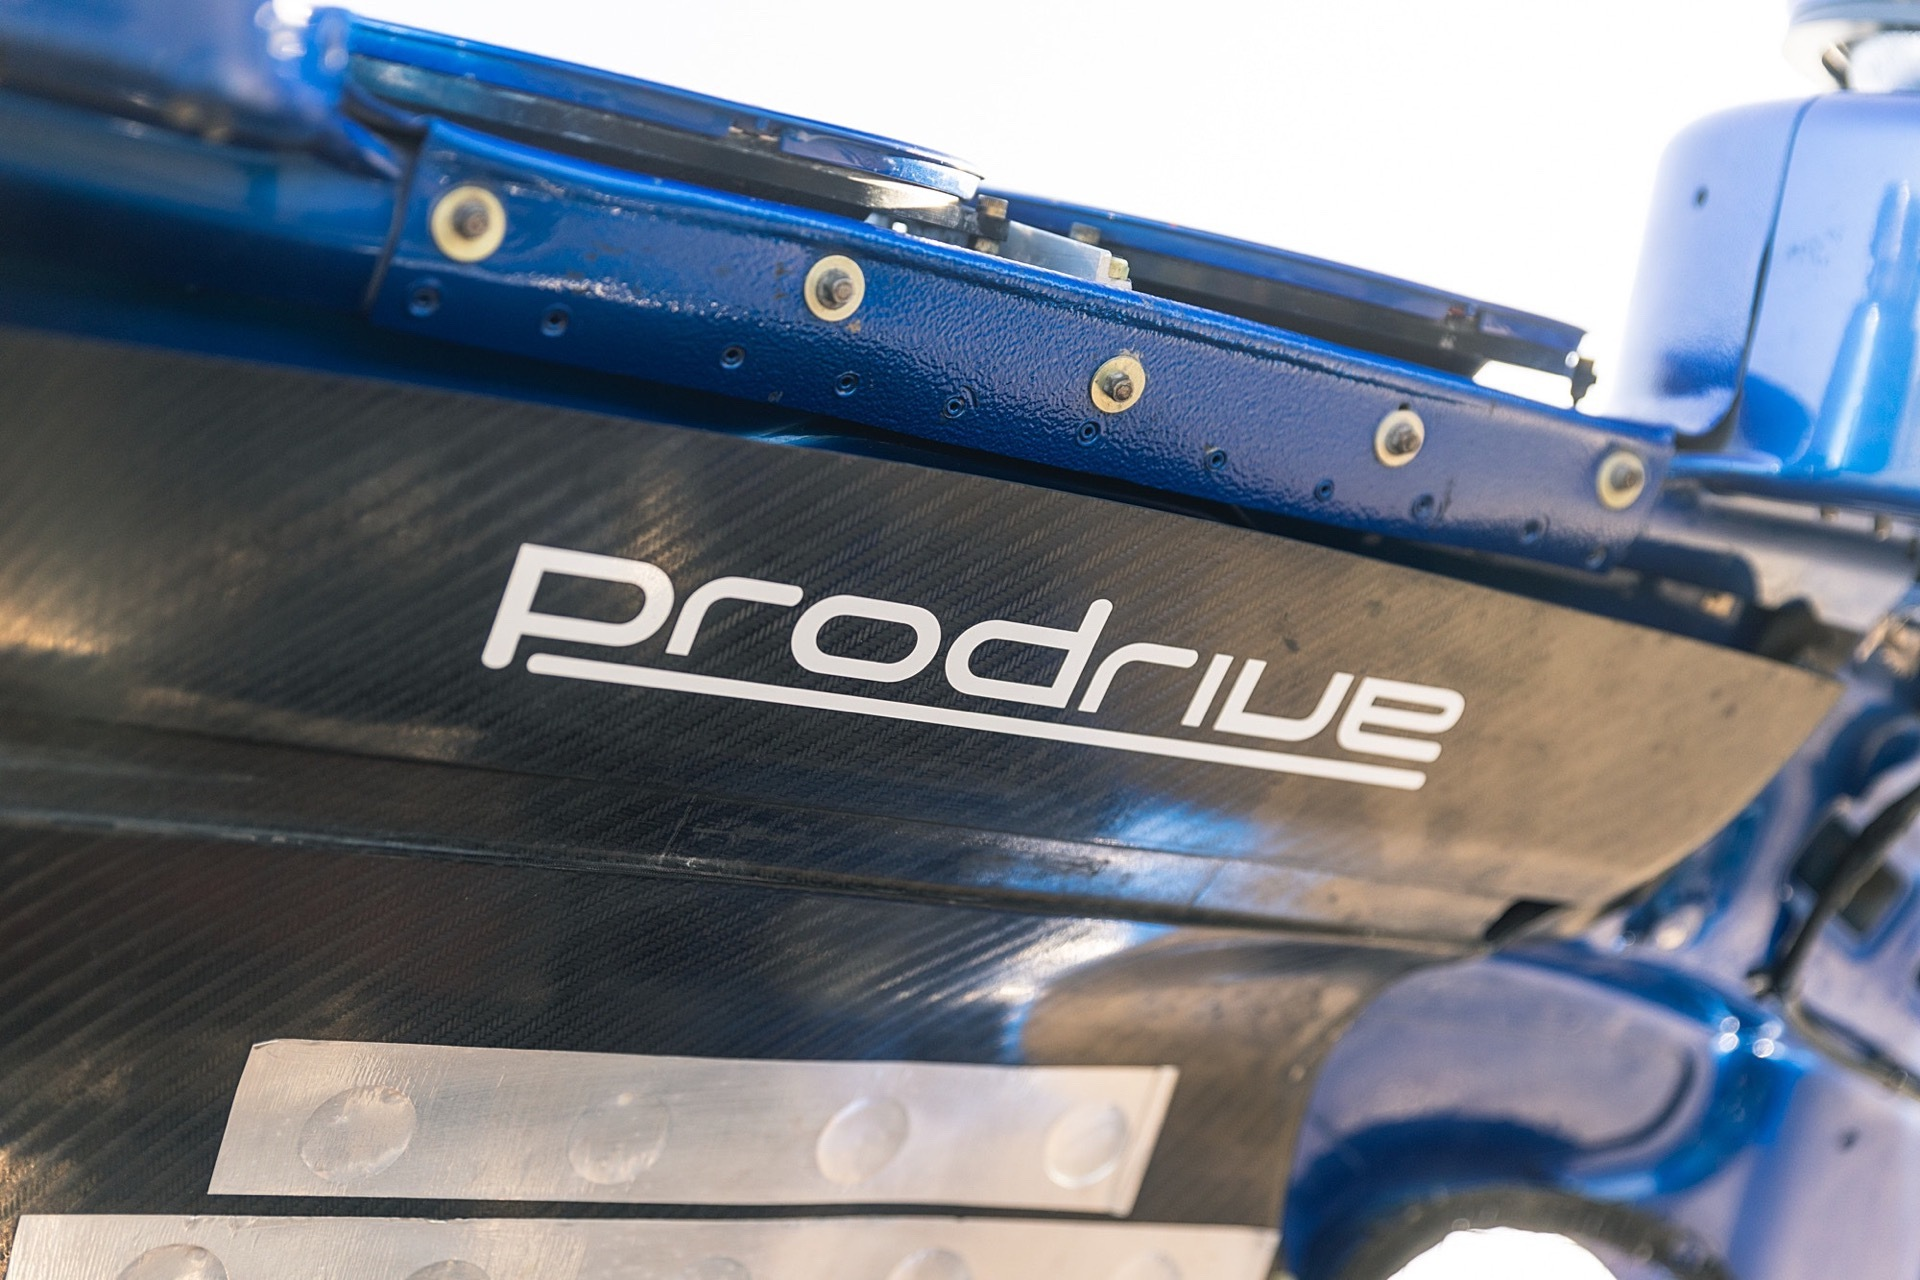 Richard_Burns_Subaru_Impreza_WRC_sale-0006